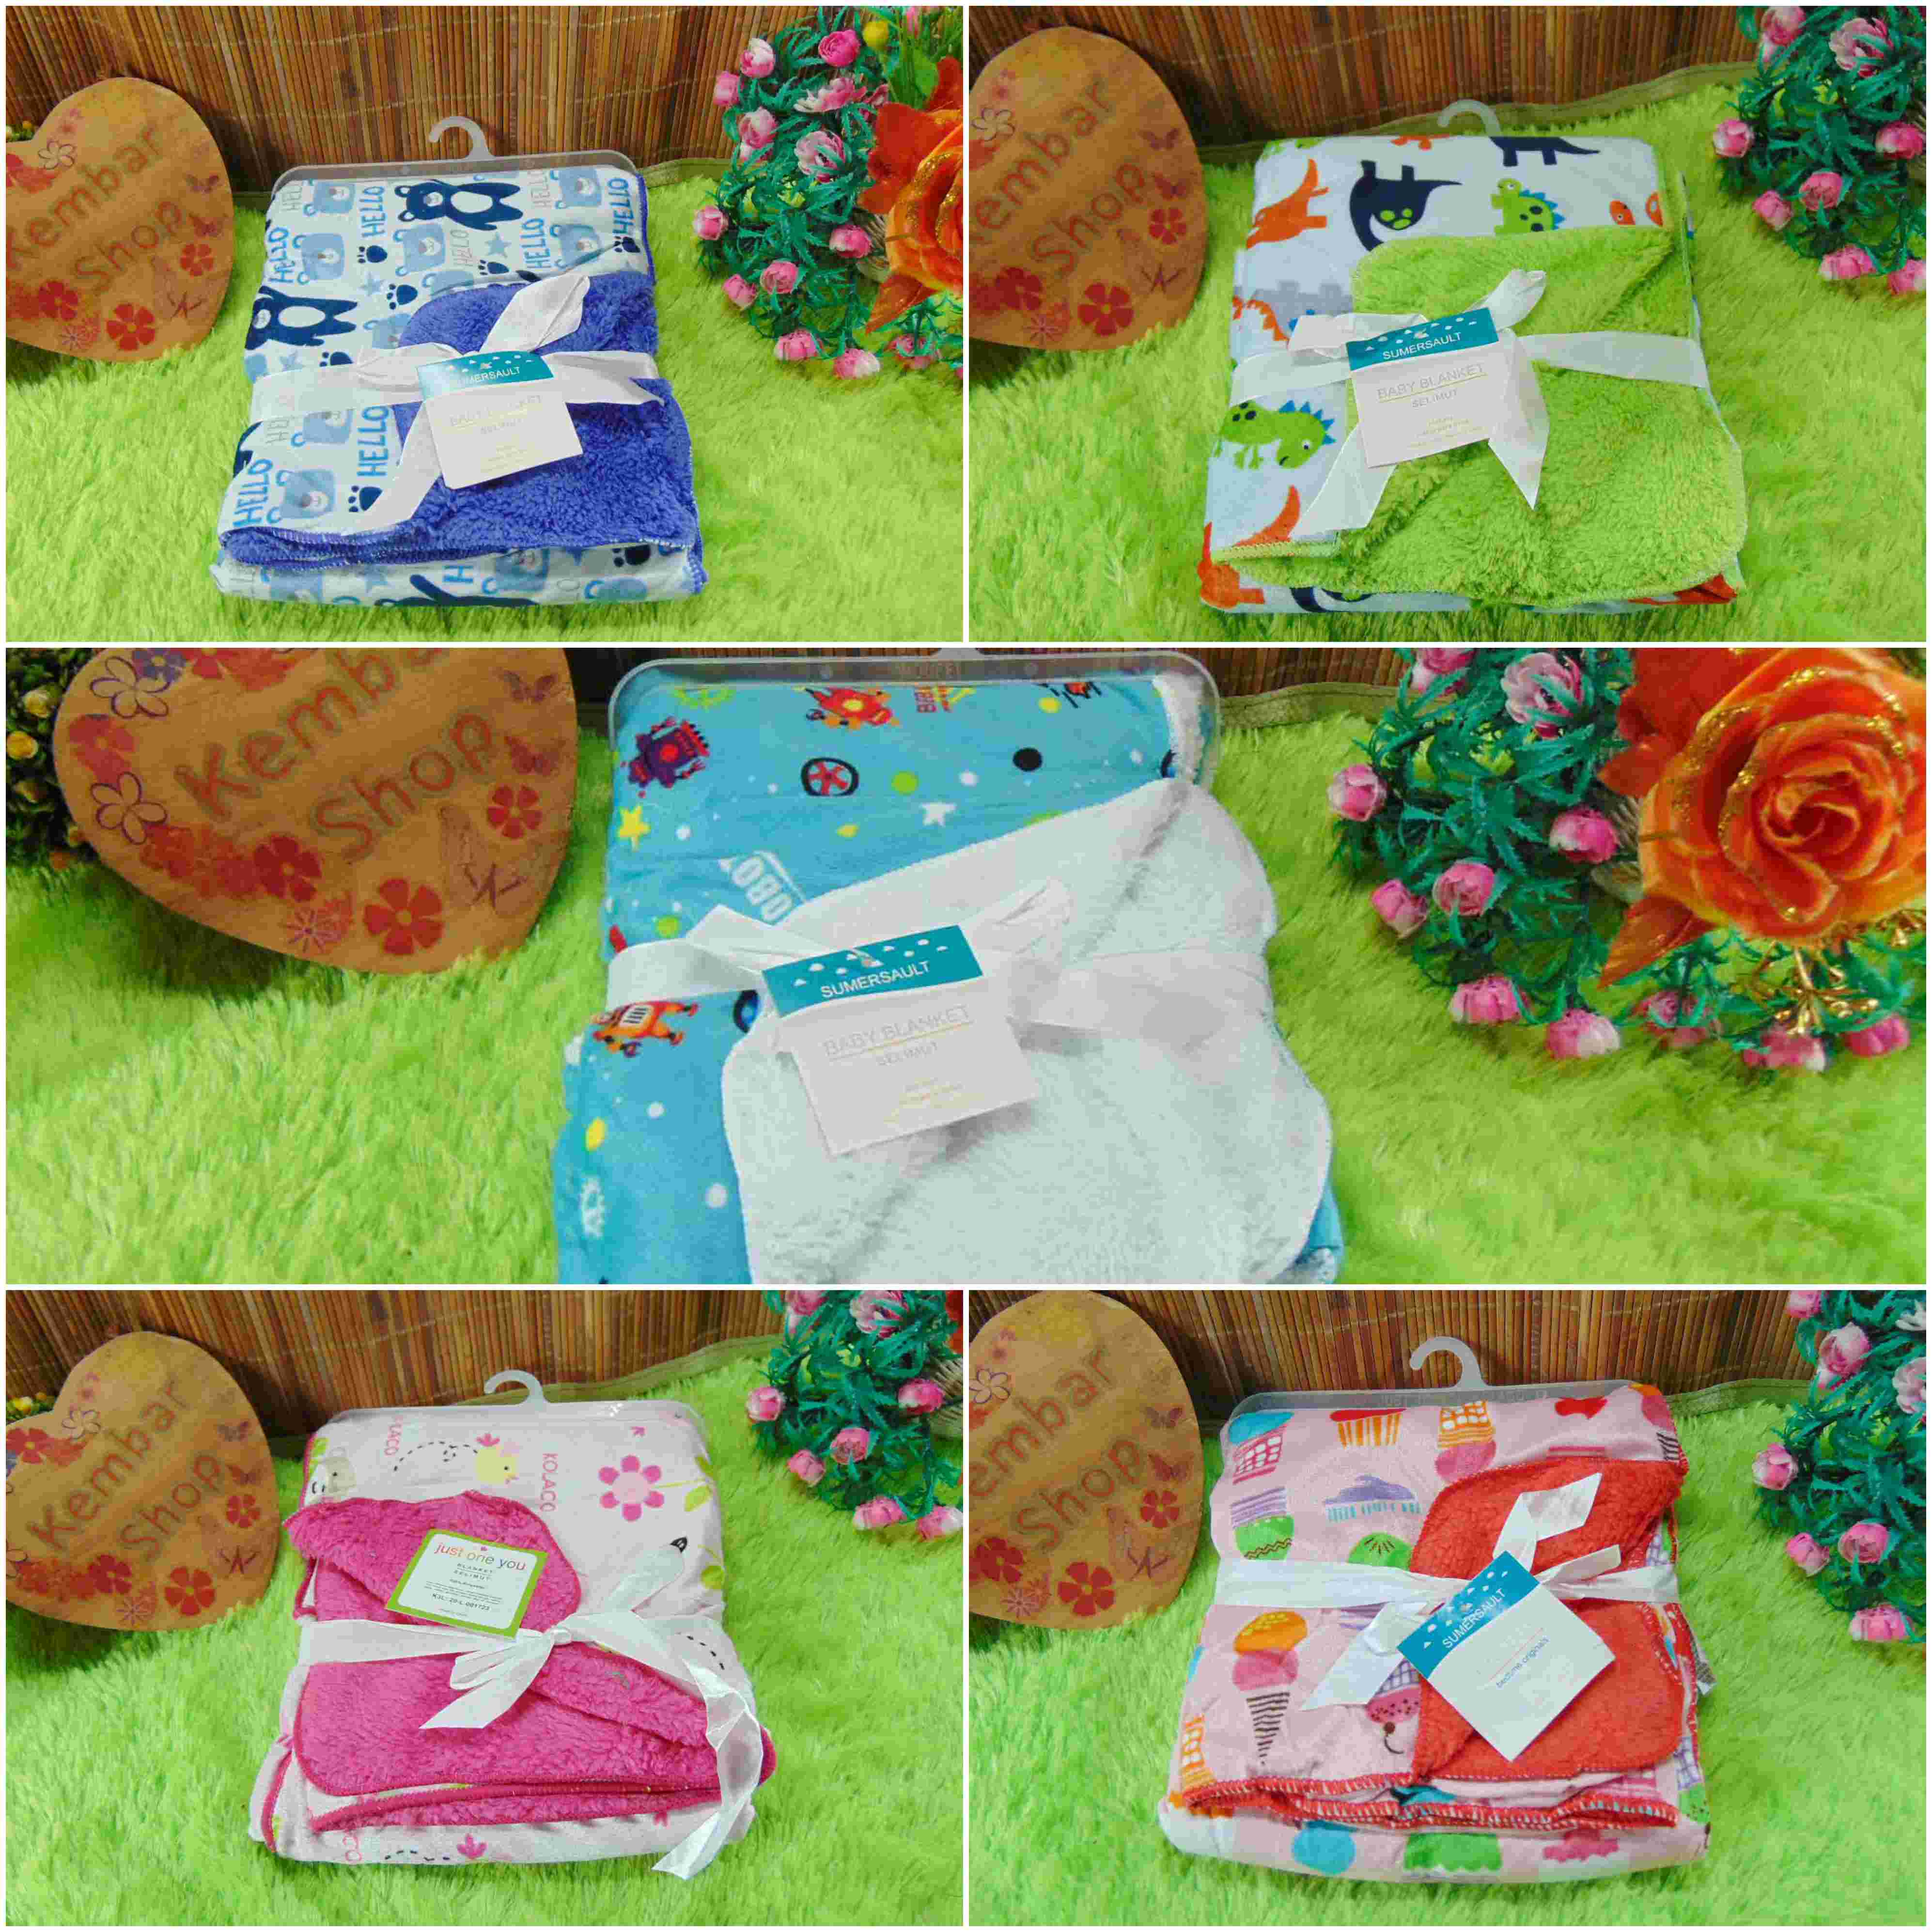 kado bayi baby gift selimut carter double fleece bayi aneka motif (1)